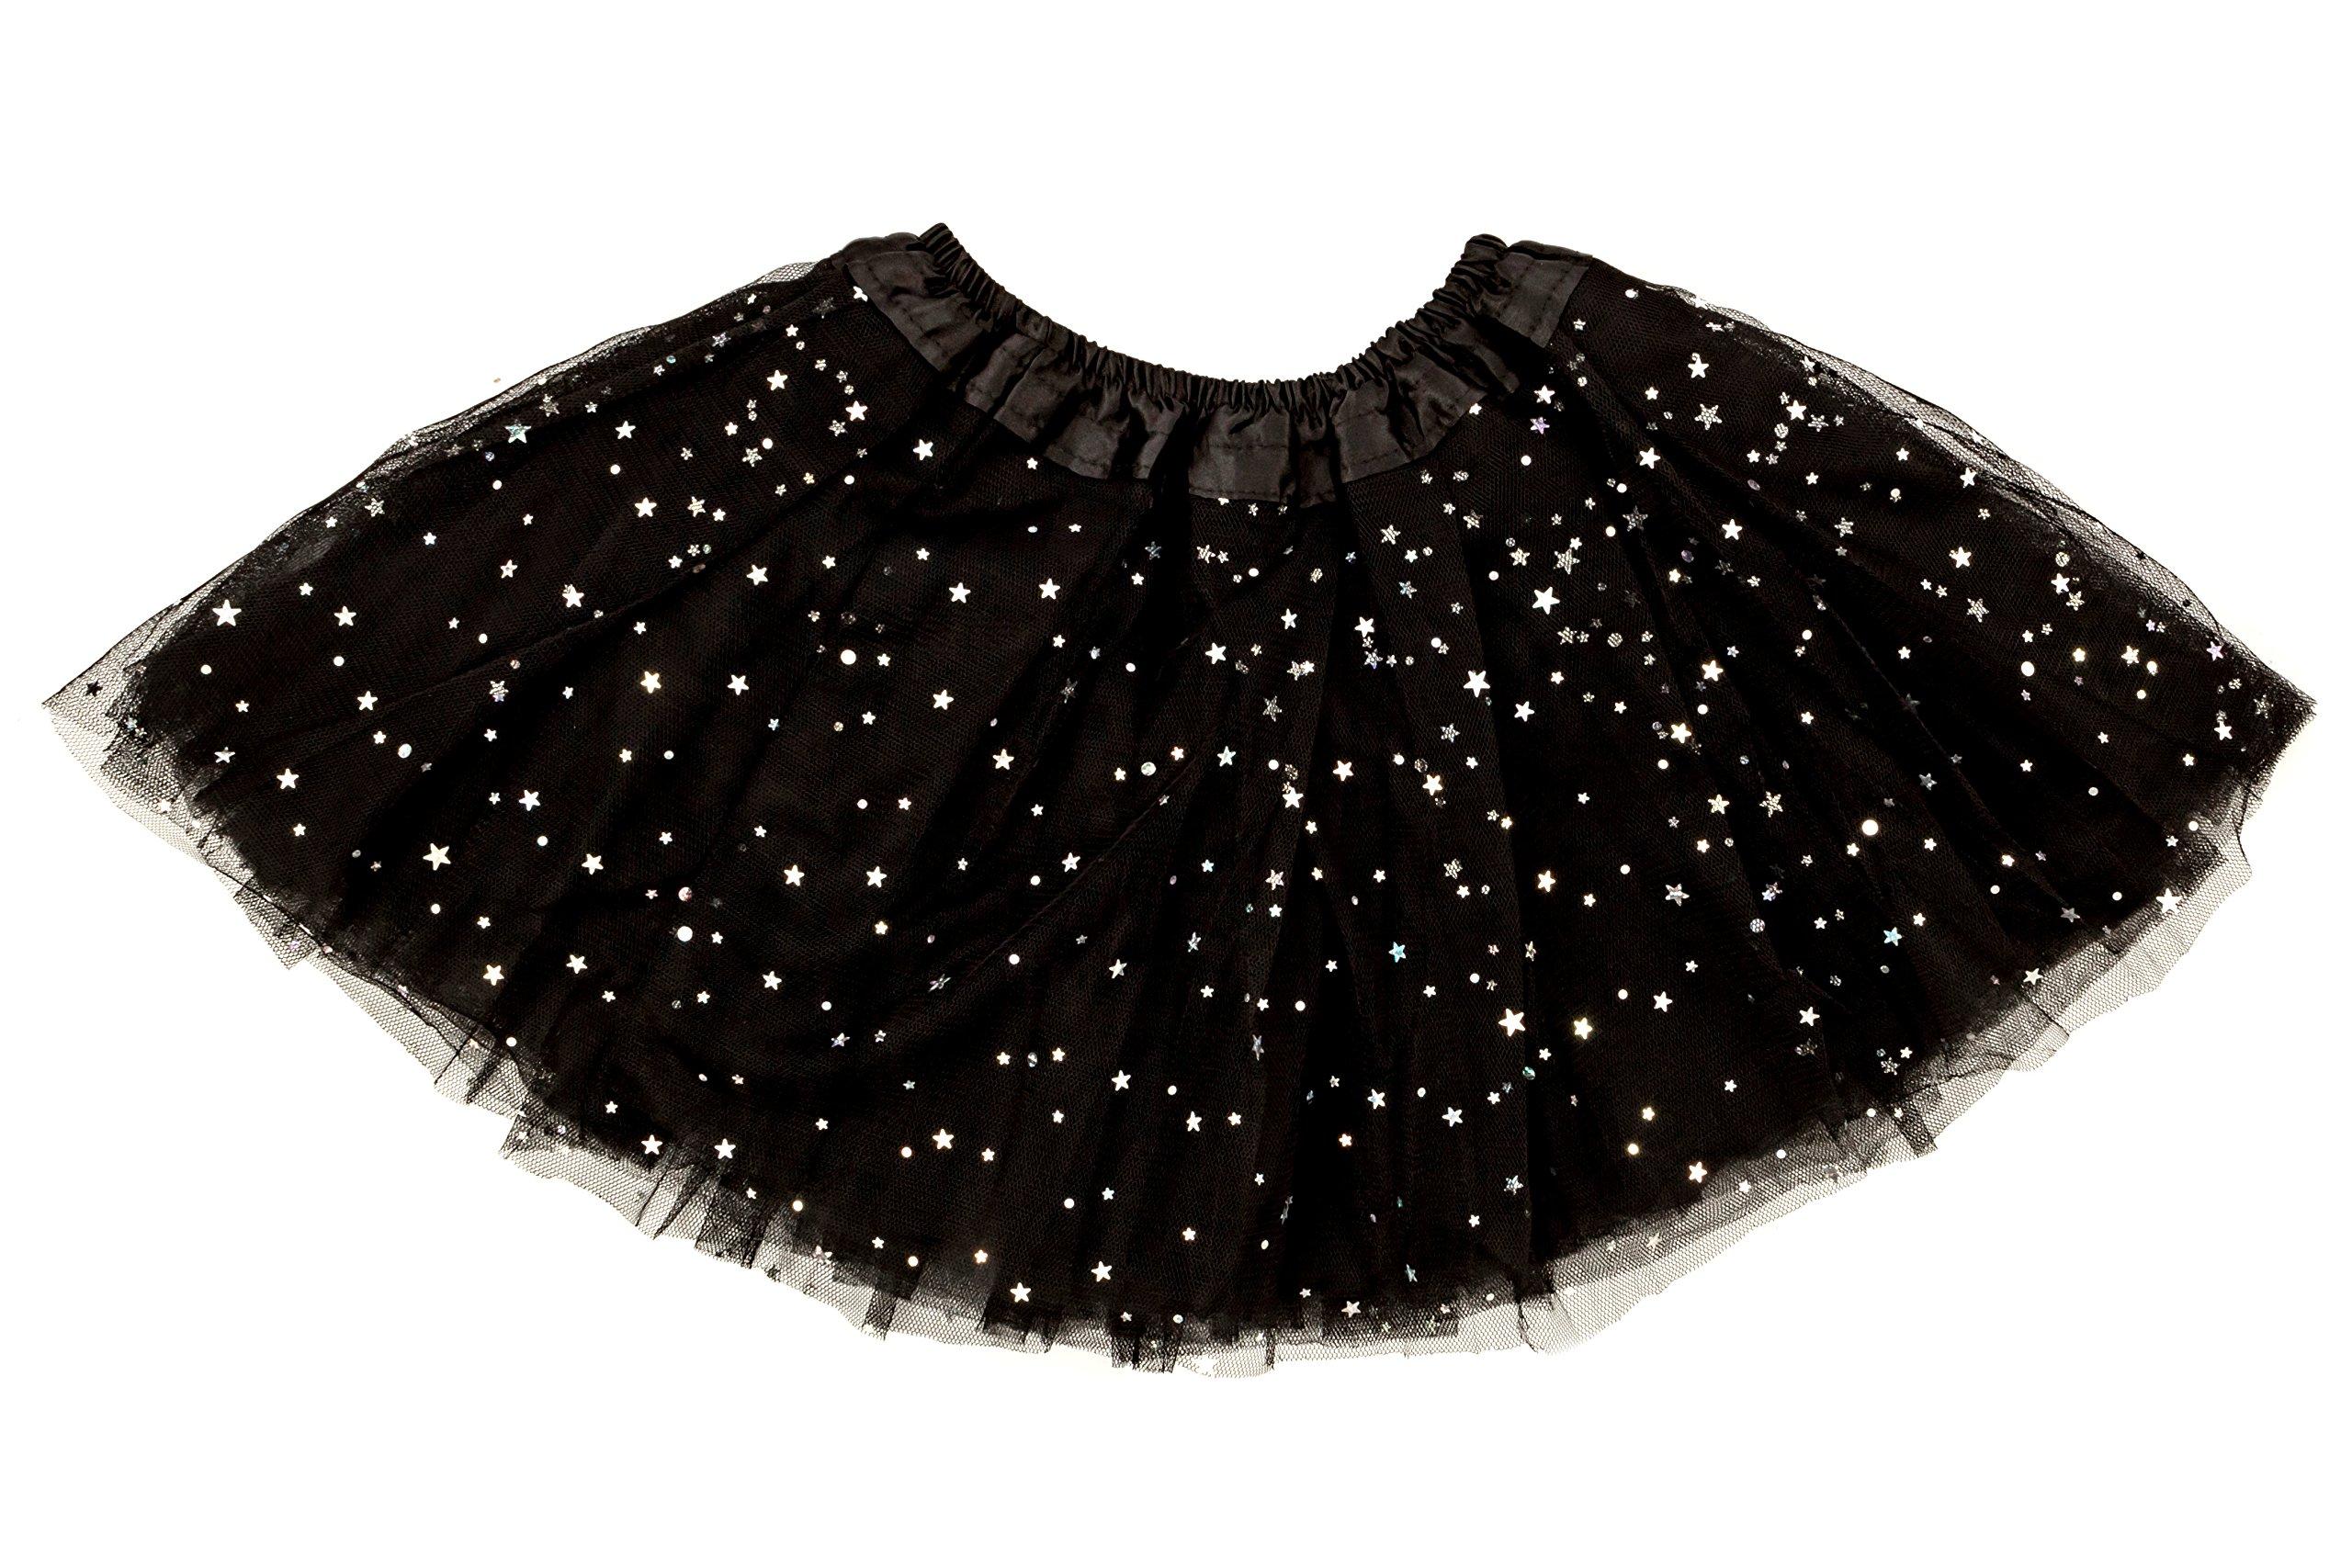 Dancina Girls 4 Layer Tutu Party Dress 2-7 Years Black by Dancina